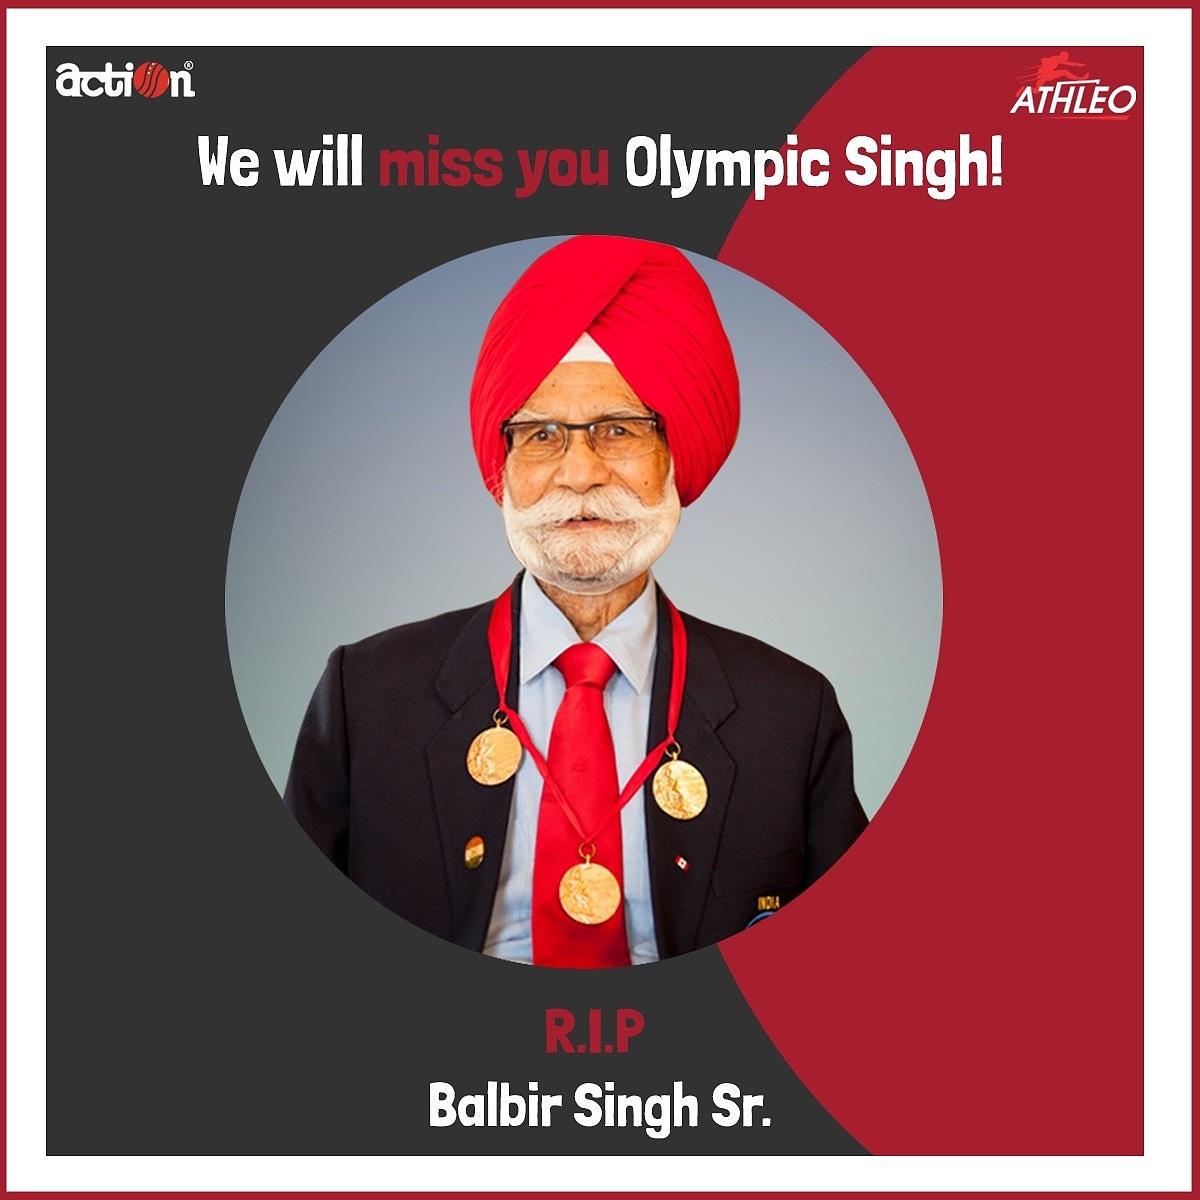 Rest in peace champion.   #balbirsingh #olympics #hockey #indiansports #rip #athleoshoes #actionshoes #icon #legend #Coronamemes #quarantined #ShoeShopping #Shoes #Confidence #Fitness #Age #Fit2020 #shoeaddict  #IndiaFightsCorona #letsfightcoronavirus #inthistogether #curfews https://t.co/VP8dNfTBVR